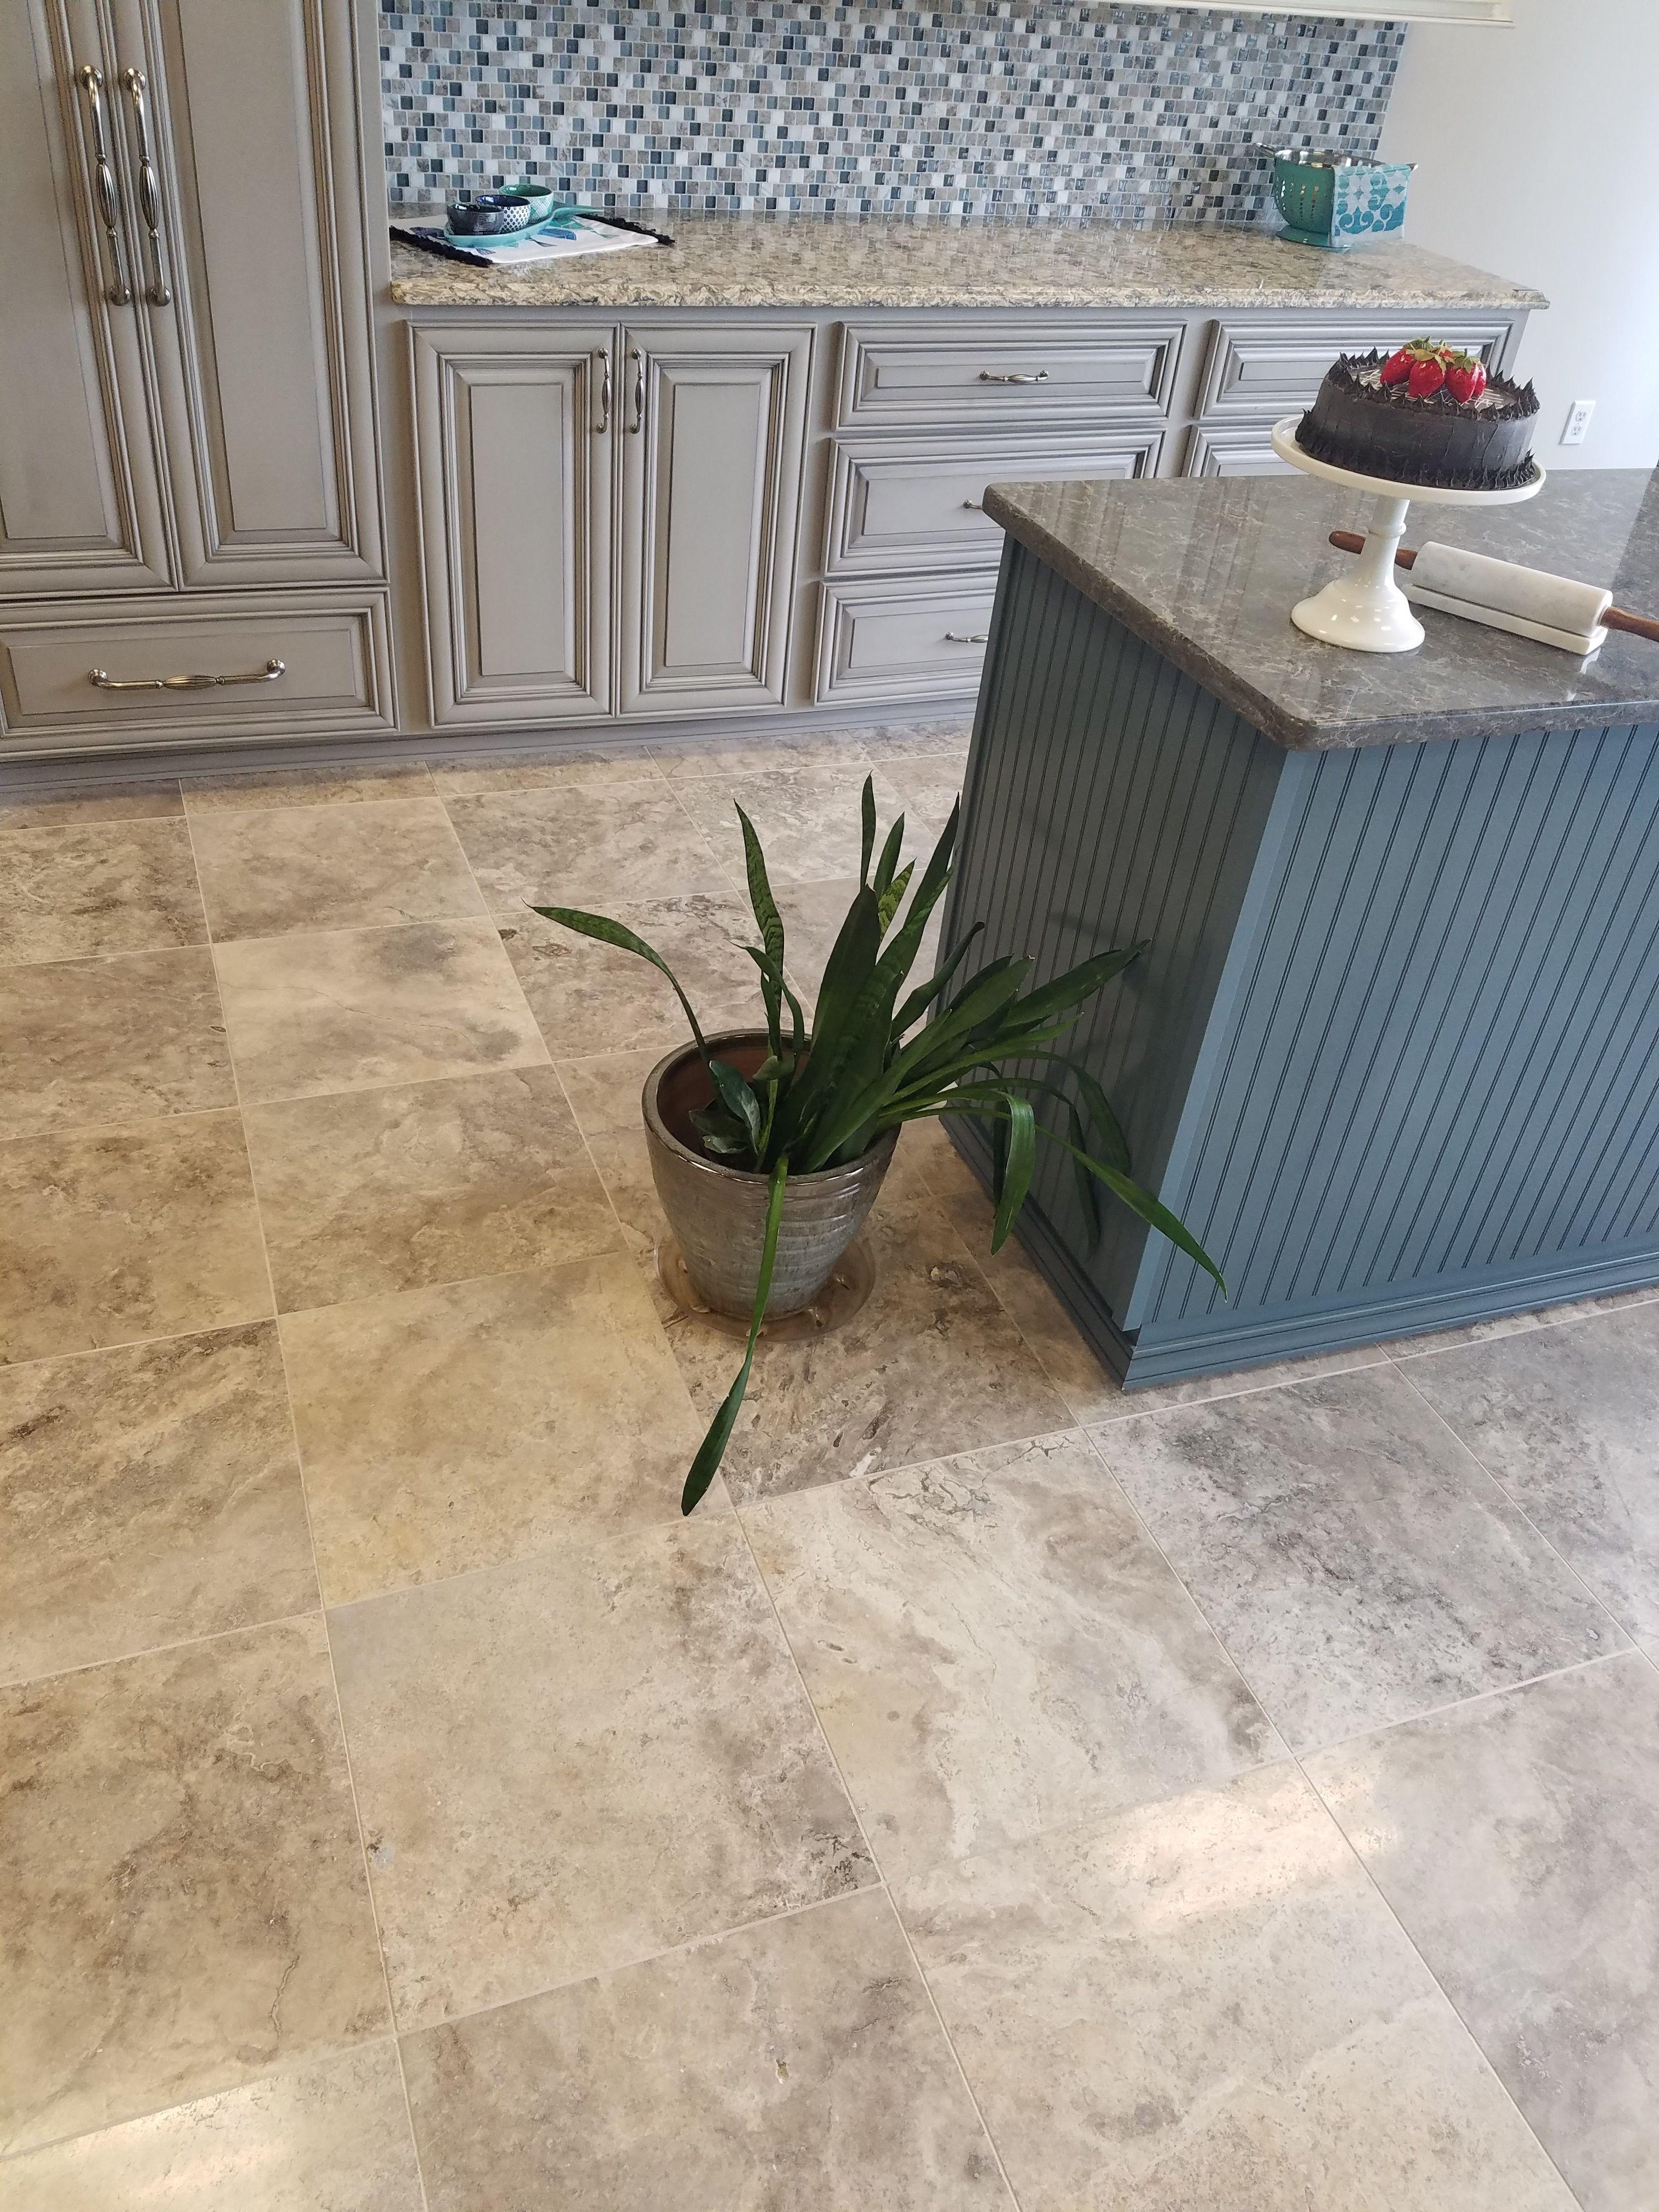 Silver 18x18 High Honed Travertine Tile Kitchen Flooring Remodel Kitchen Floor Tile Backsplash With Dark Cabinets Trendy Kitchen Tile